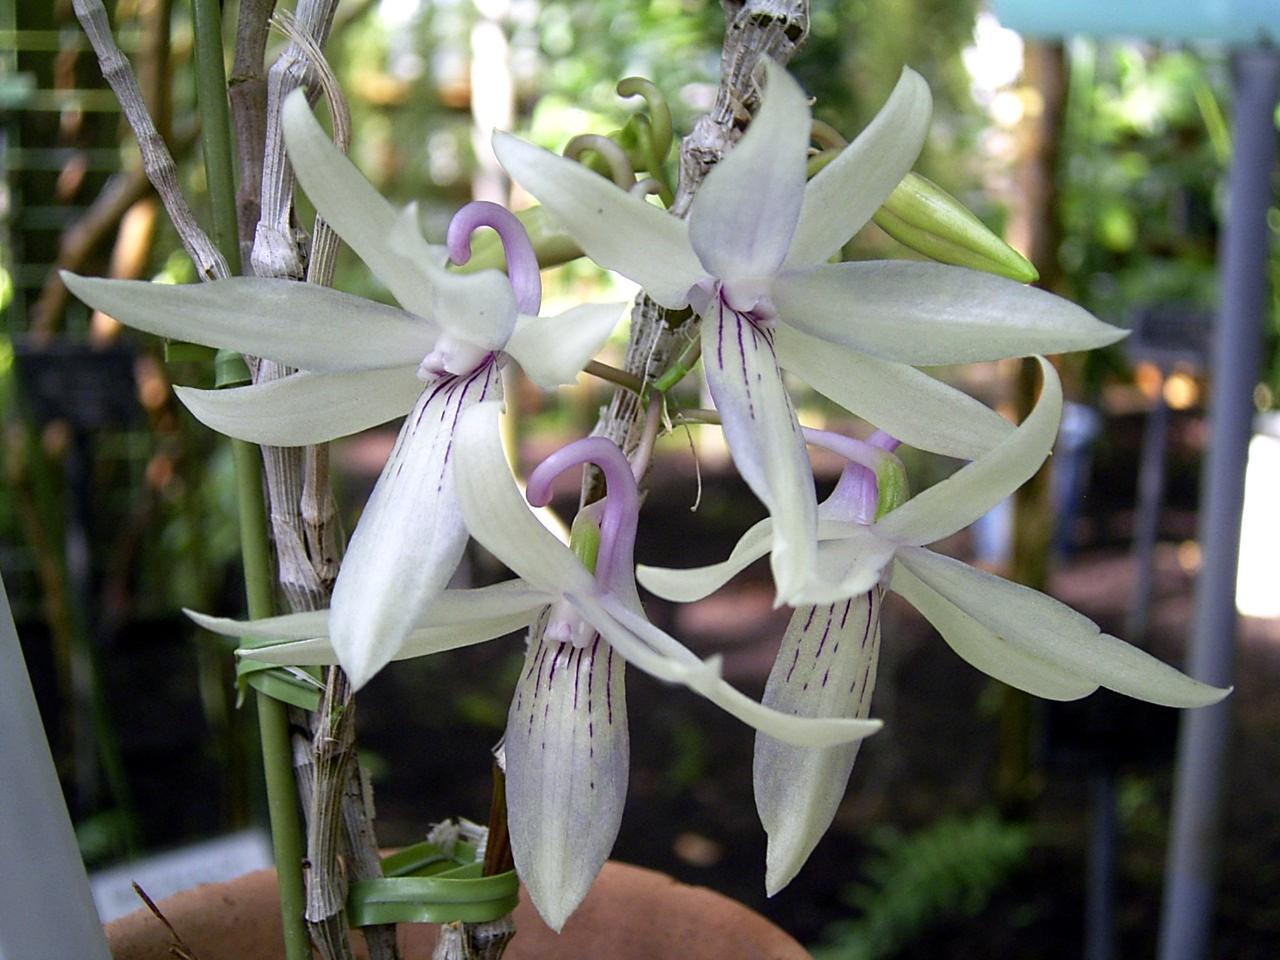 http://orchids.la.coocan.jp/Dendrobium/Dendrobium%20ceraula/R0049303.JPG